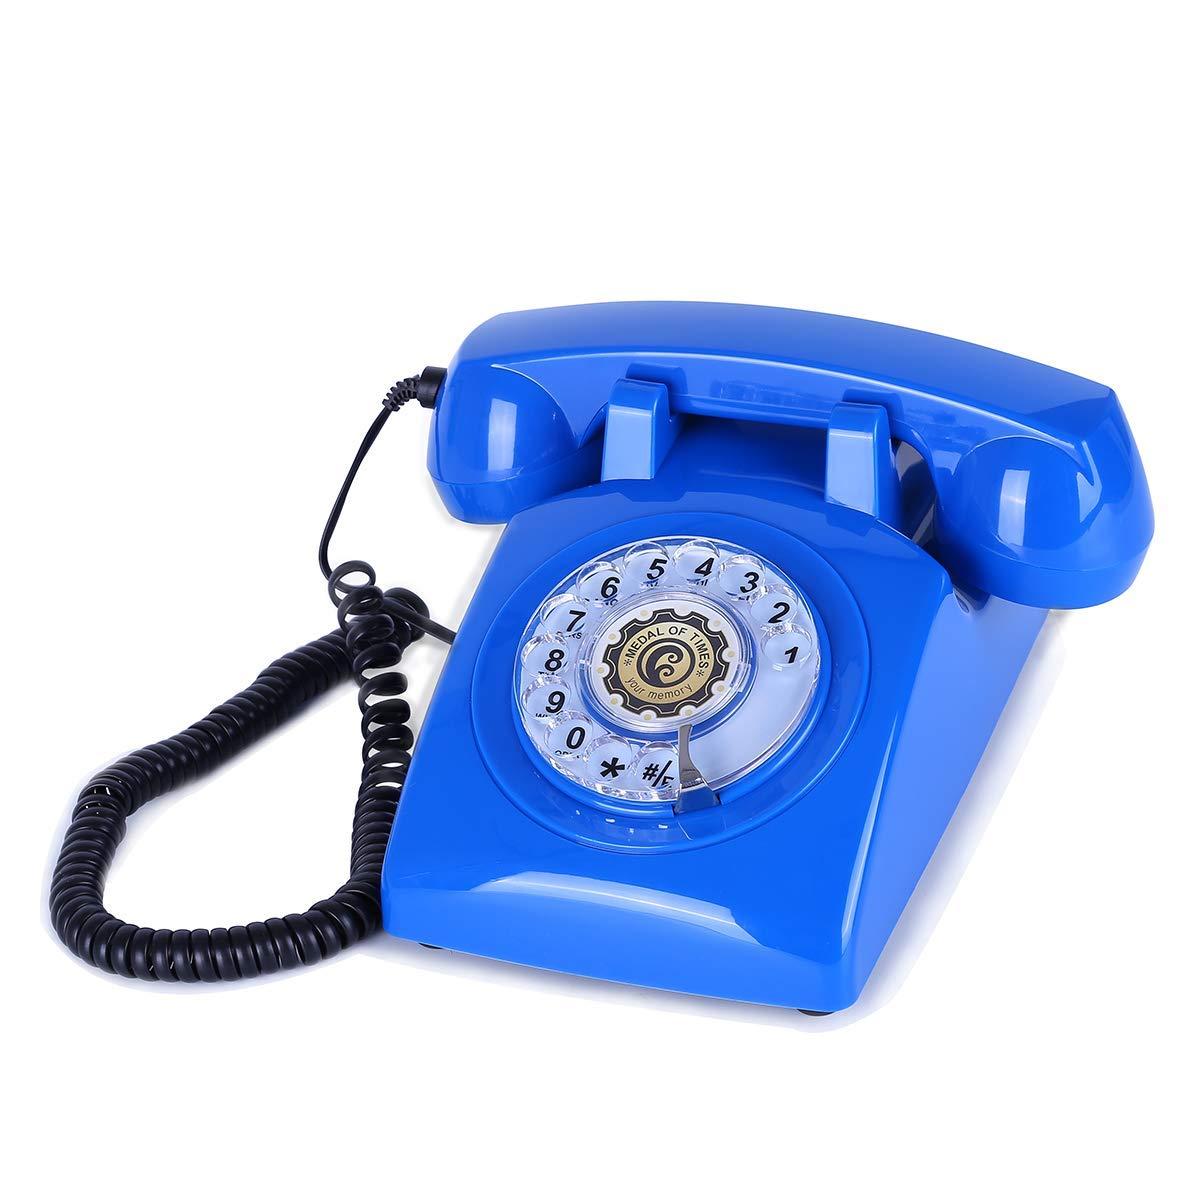 SIMTEXGREEN Rotary Dial Retro Landline Telephone Decorative Phone 1960's Style Classic Desk Telephone Home (Skyblue)